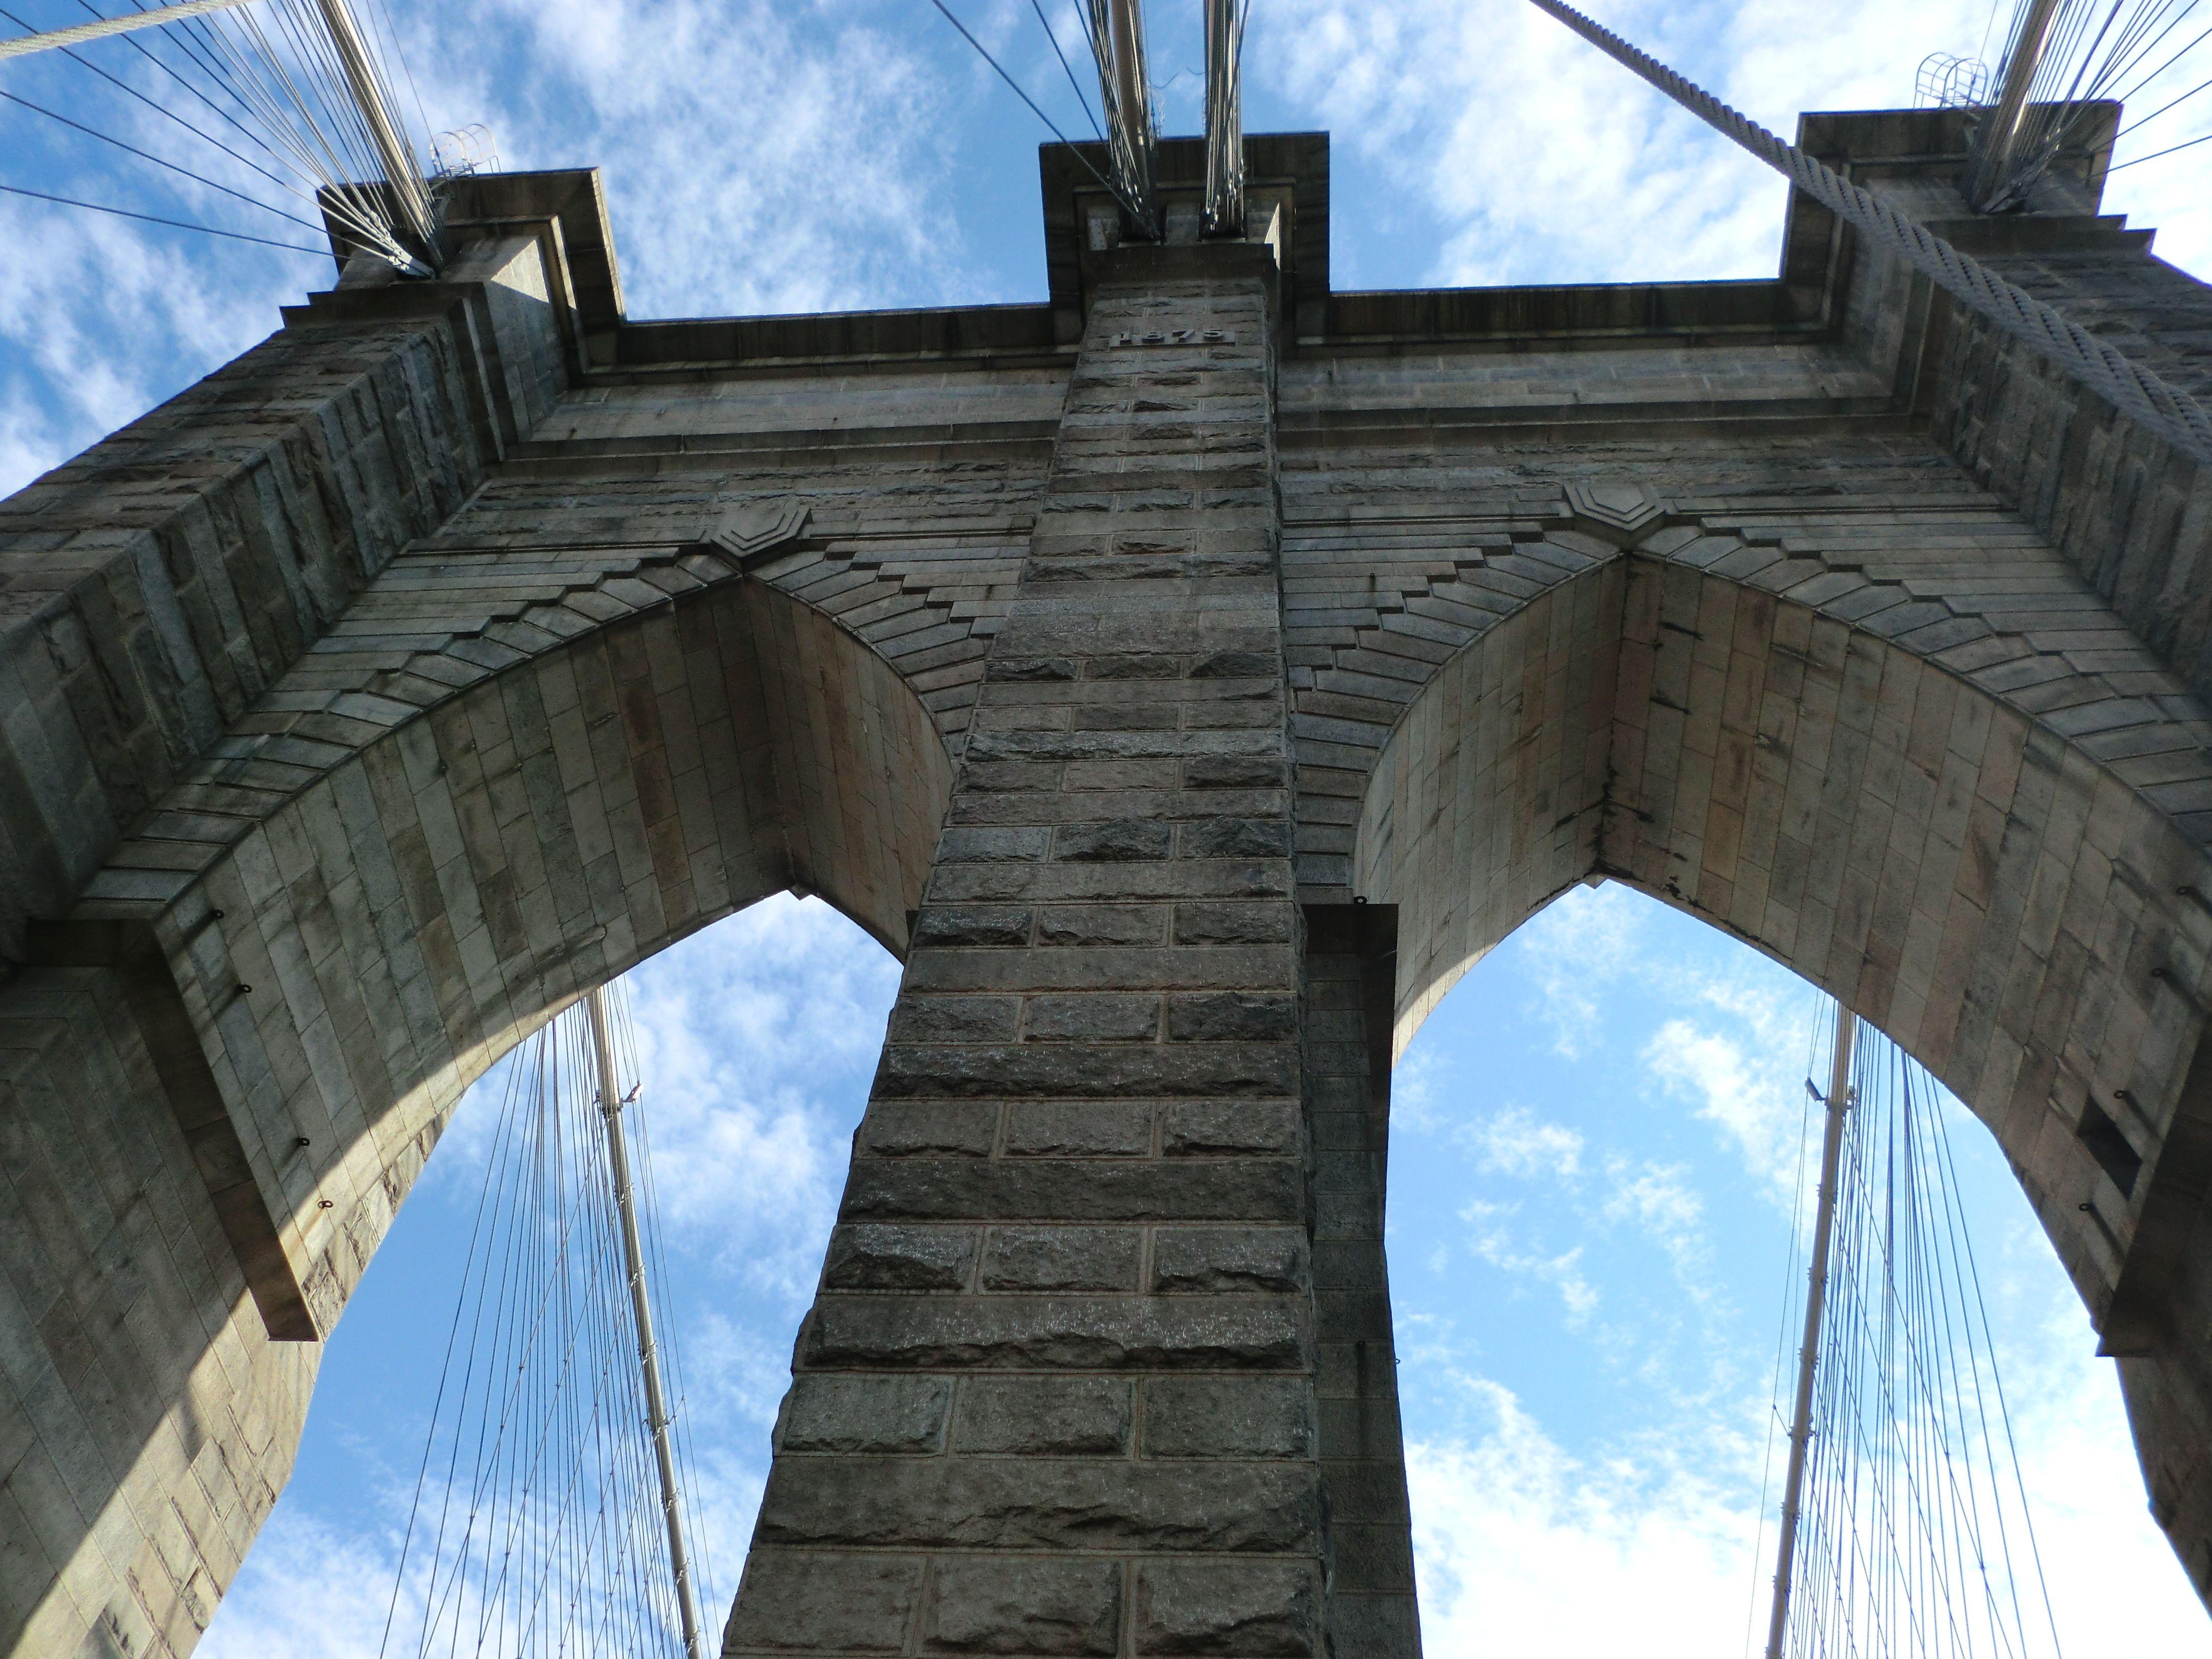 Brooklyn Bridge. Photo by Fanny Sura, 2012